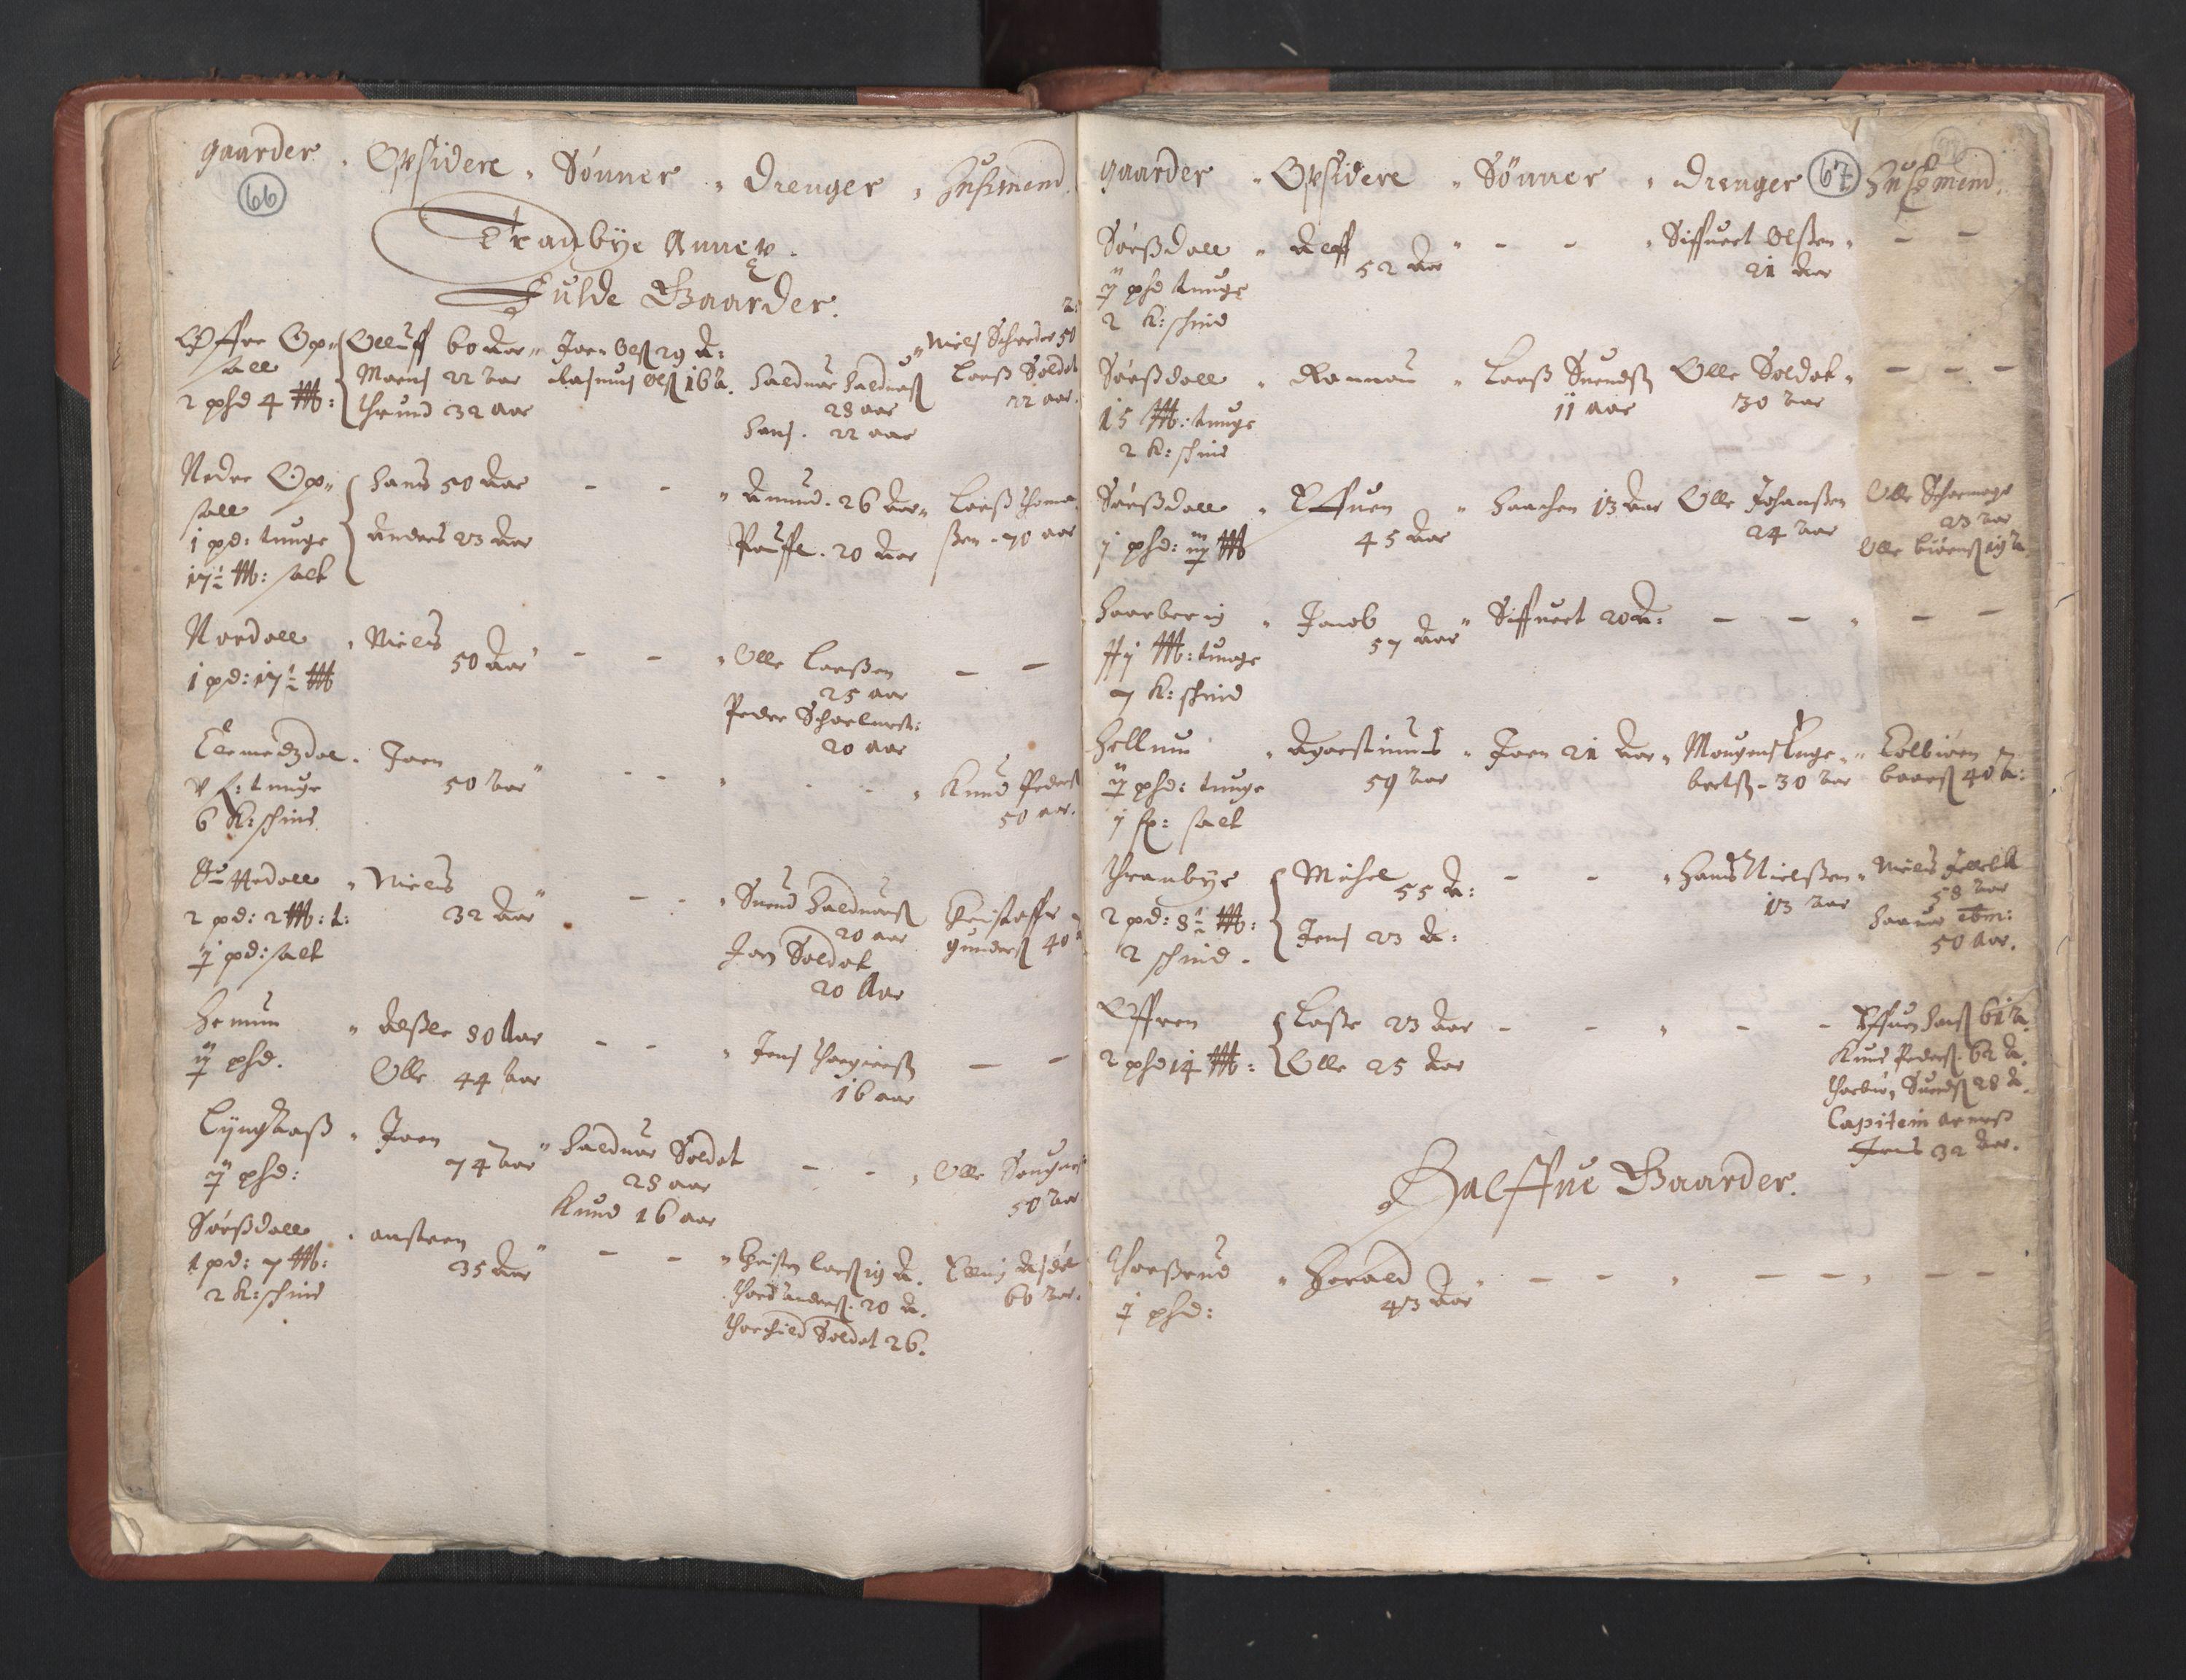 RA, Fogdenes og sorenskrivernes manntall 1664-1666, nr. 5: Fogderier (len og skipreider) i nåværende Buskerud fylke og Vestfold fylke, 1664, s. 66-67